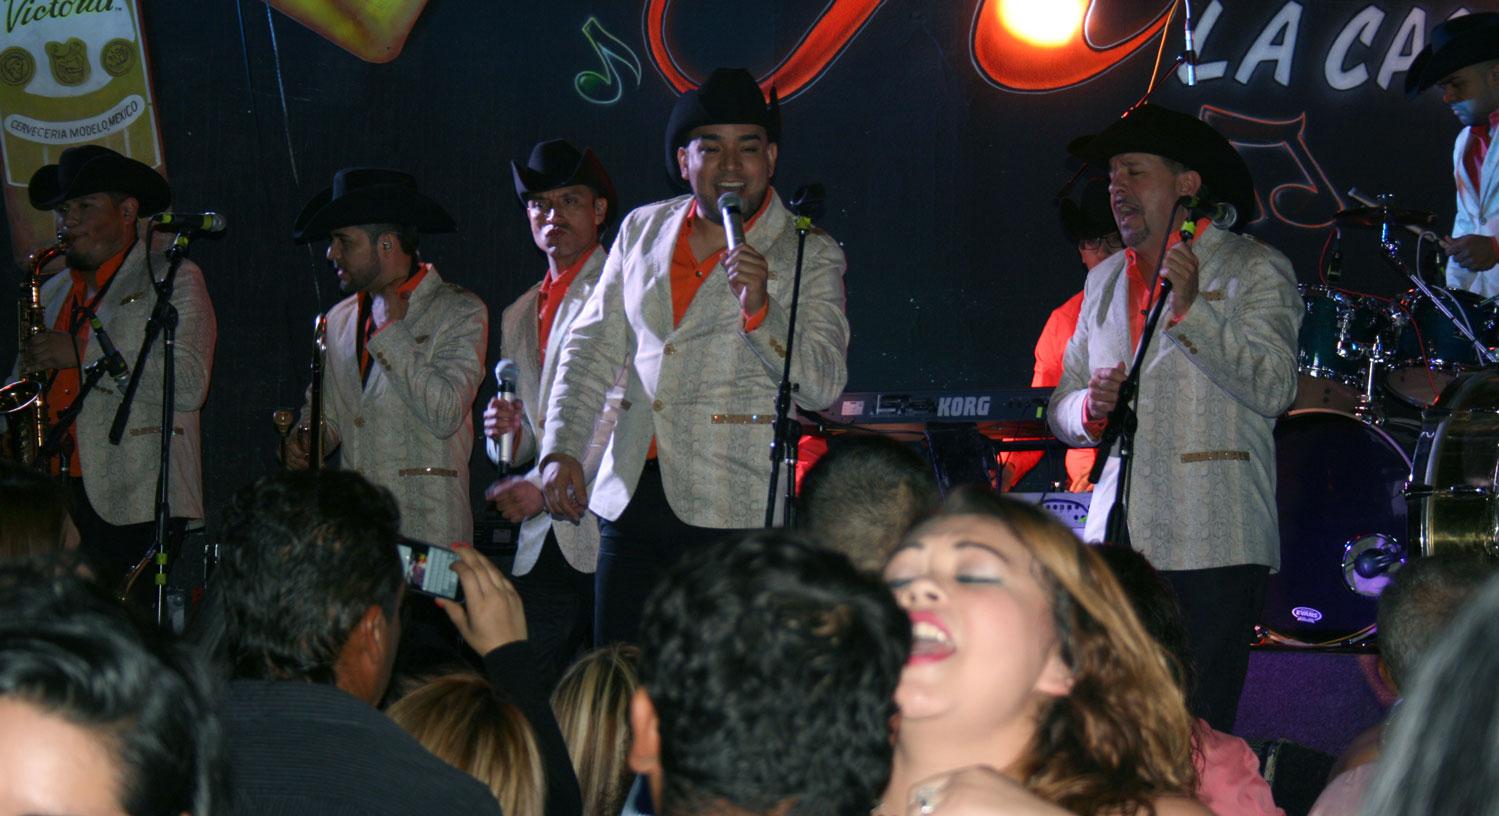 Fresno, CA 5.29.2015 - Montez De Durango